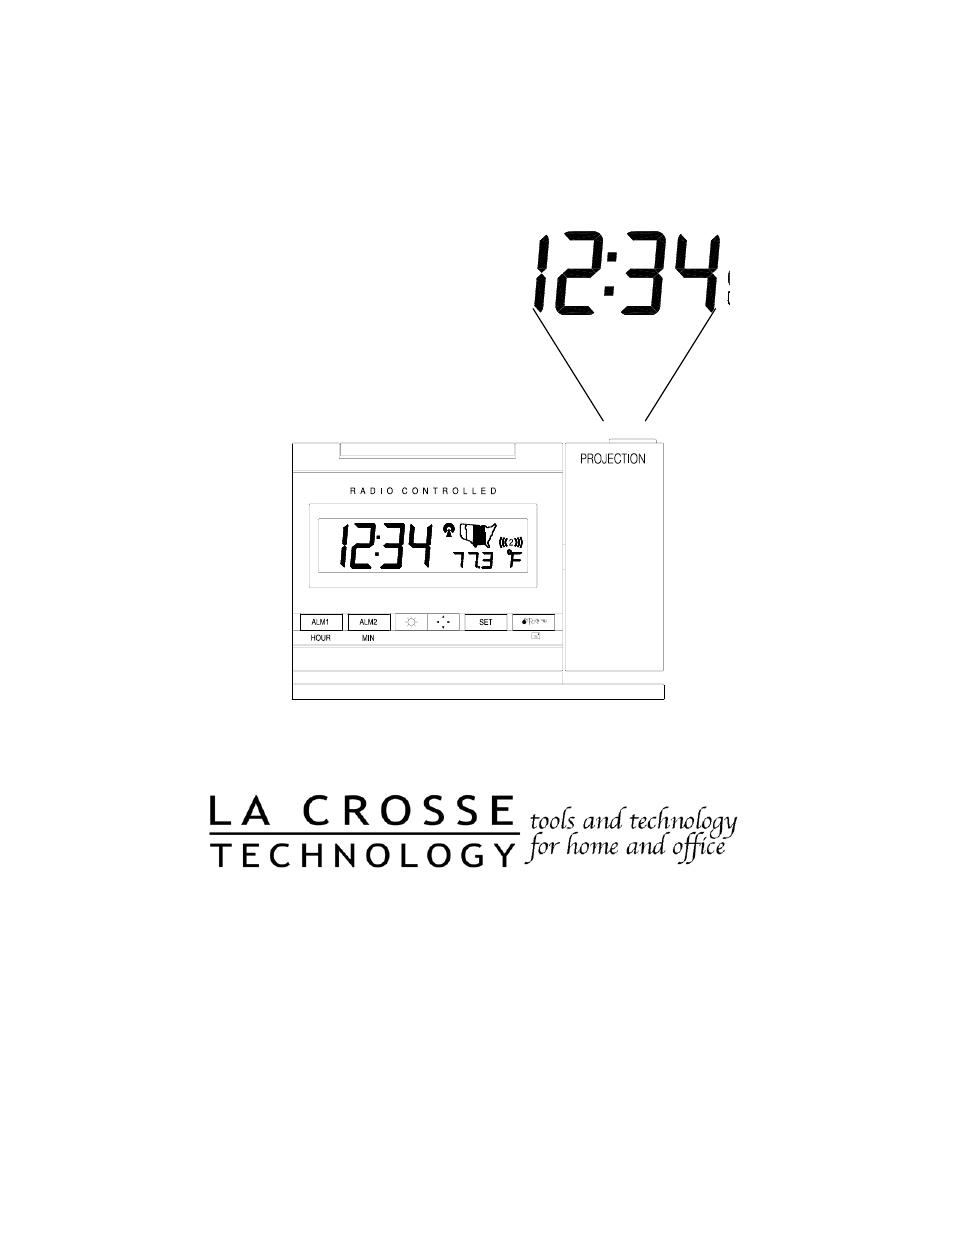 la crosse technology wt 5720 user manual 18 pages rh manualsdir com la crosse technology weather station user manual La Crosse Weather Station Manual